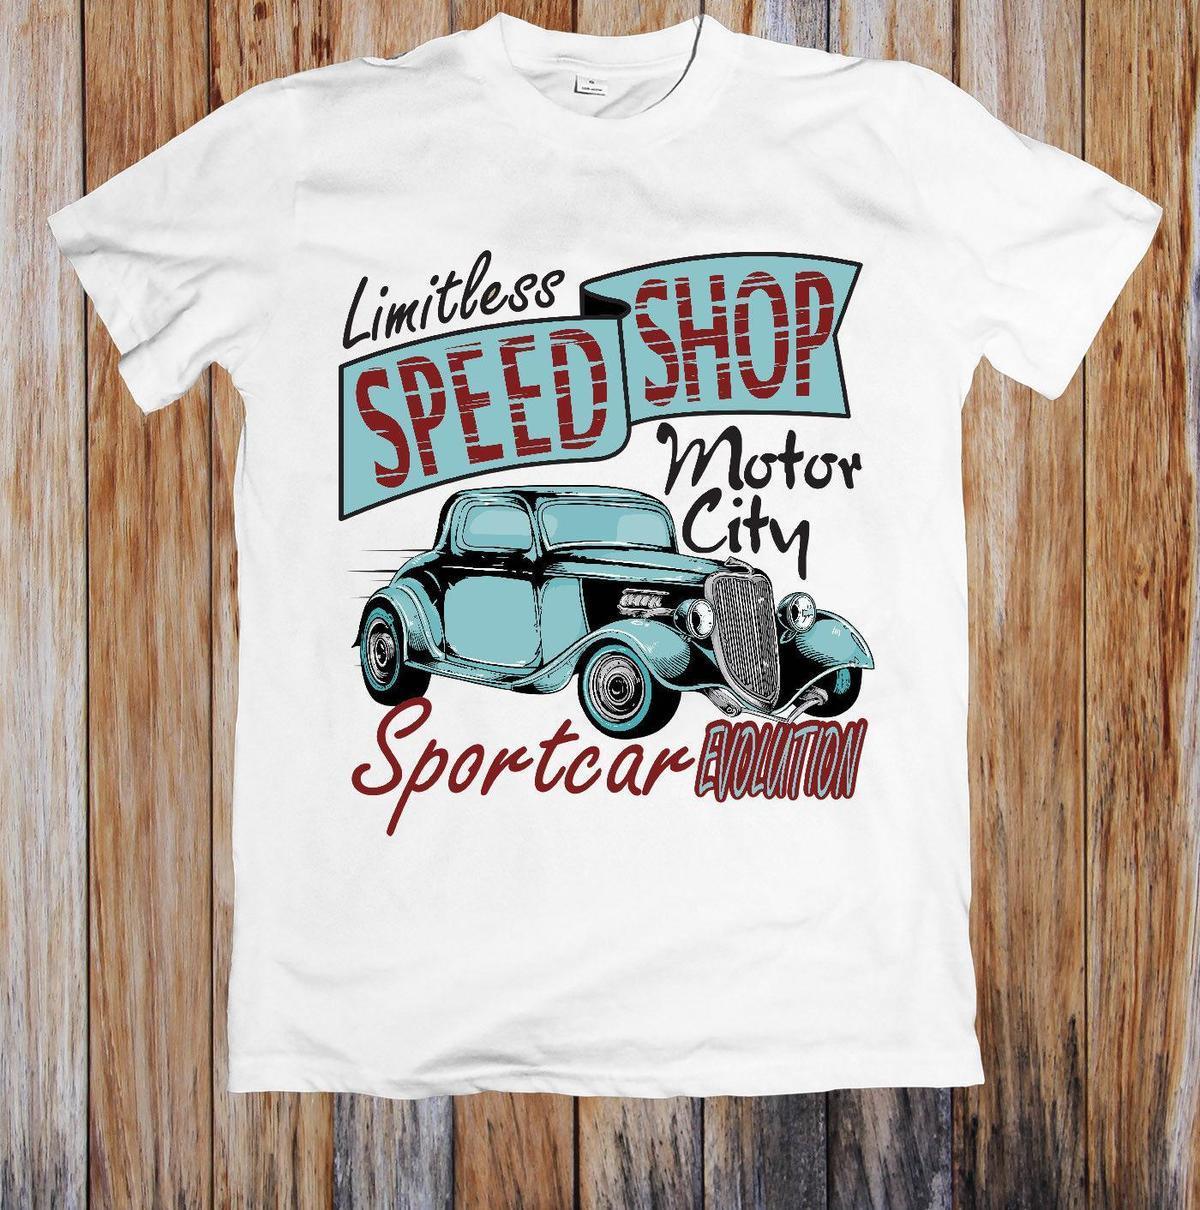 3e62aee7f LIMITLESS SPEED SHOP UNISEX T SHIRT Good Quality Brand Cotton Shirt Summer  Style Cool Shirts Offensive T Shirt T Shirt Slogan From Jie3